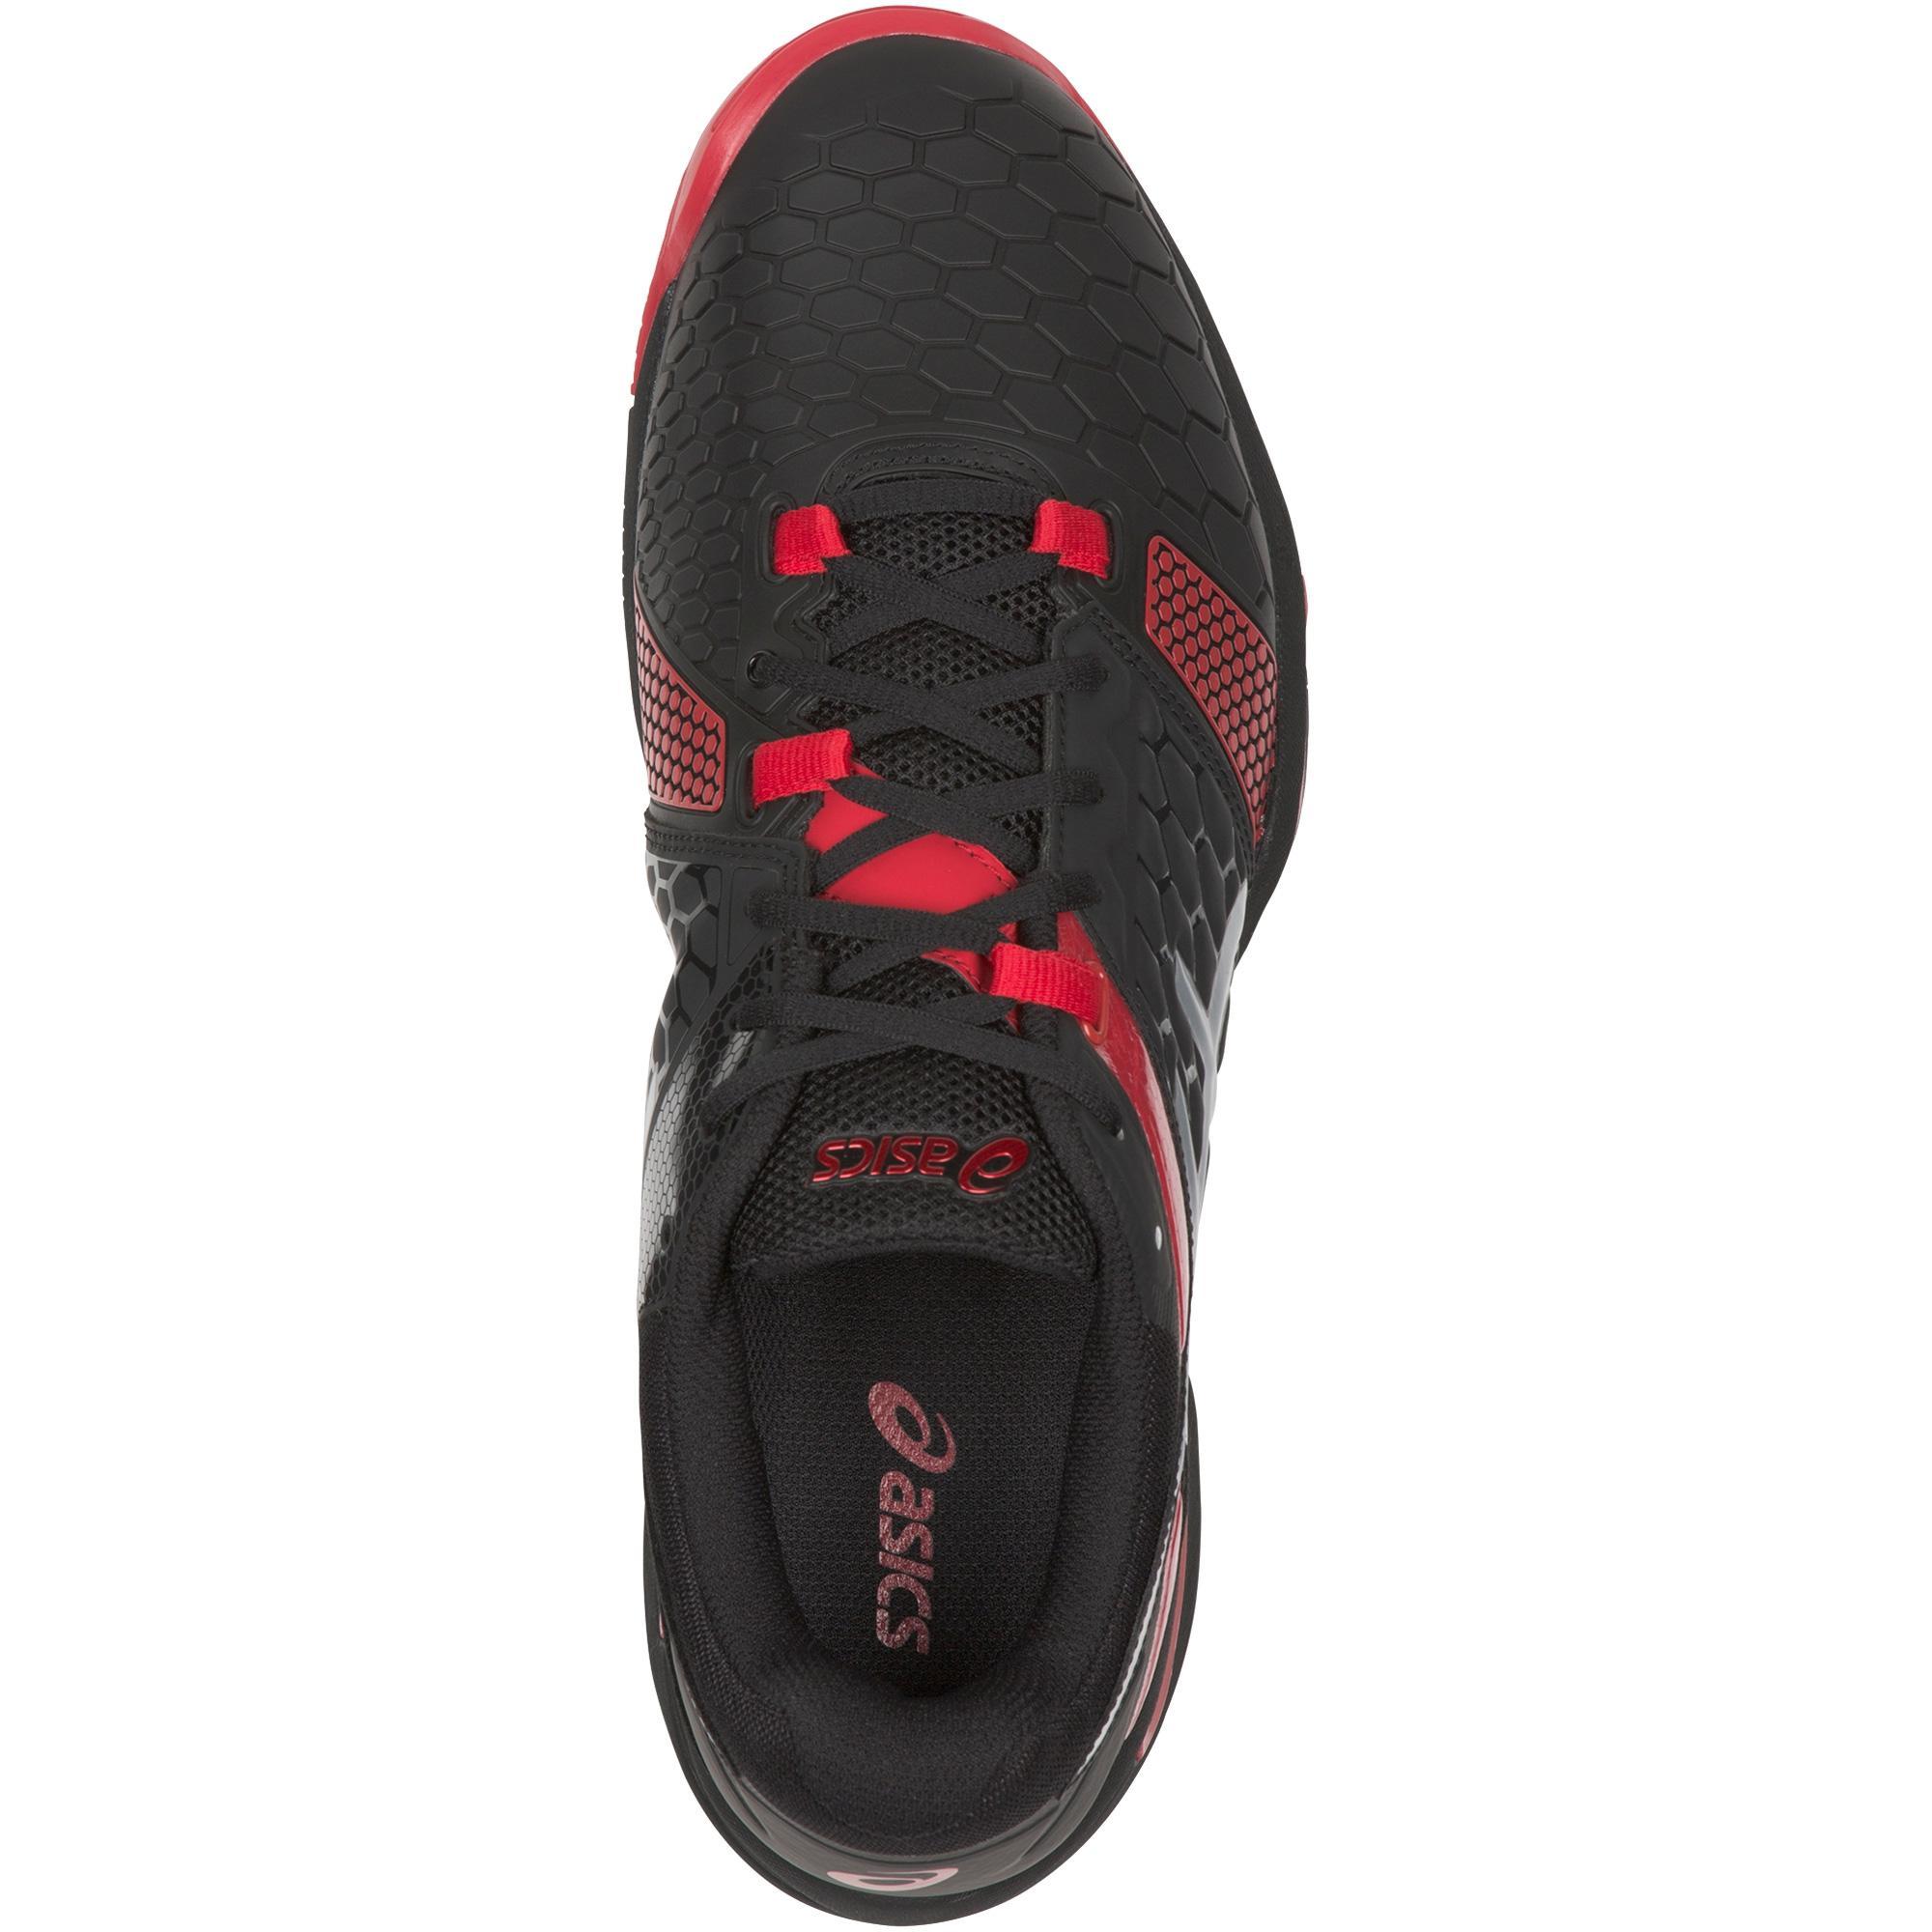 Asics Mens GEL Blast 7 Indoor Court Shoes BlackRed